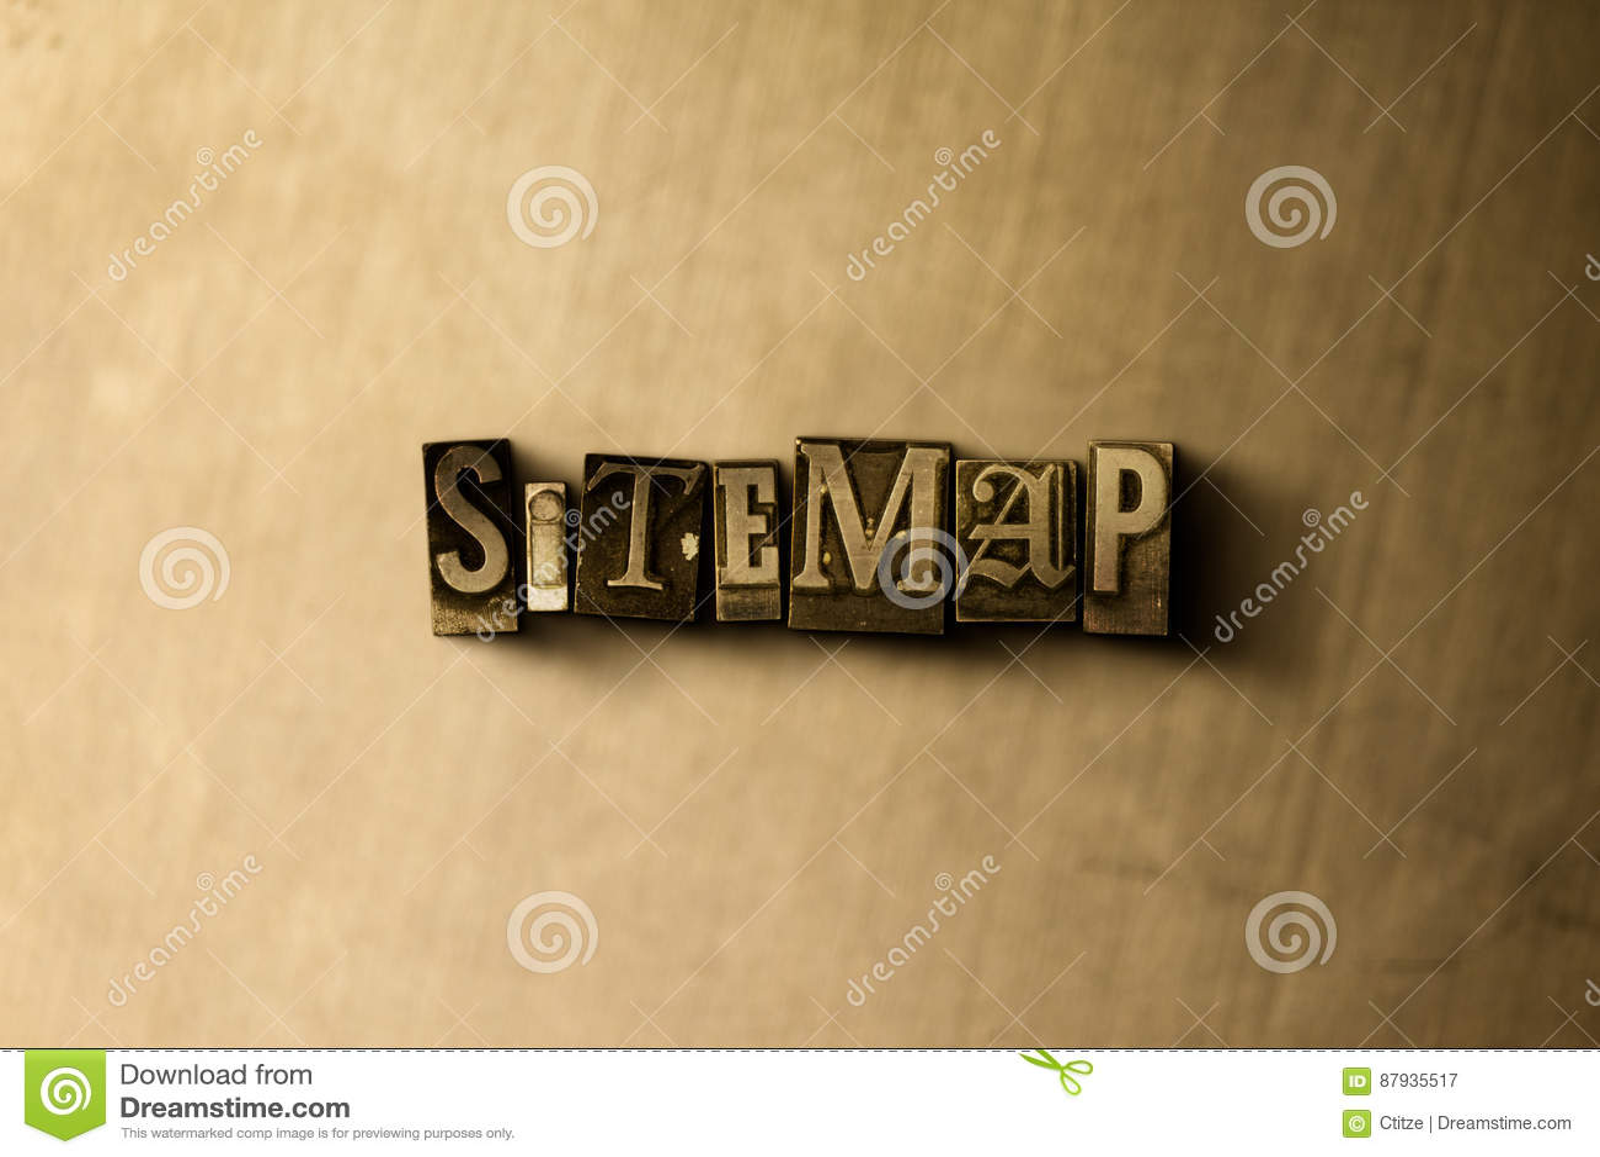 SITEMAP - κινηματογράφηση σε πρώτο πλάνο της βρώμικης στοιχειοθετημένης τρύγος λέξης στο σκηνικό μετάλλων